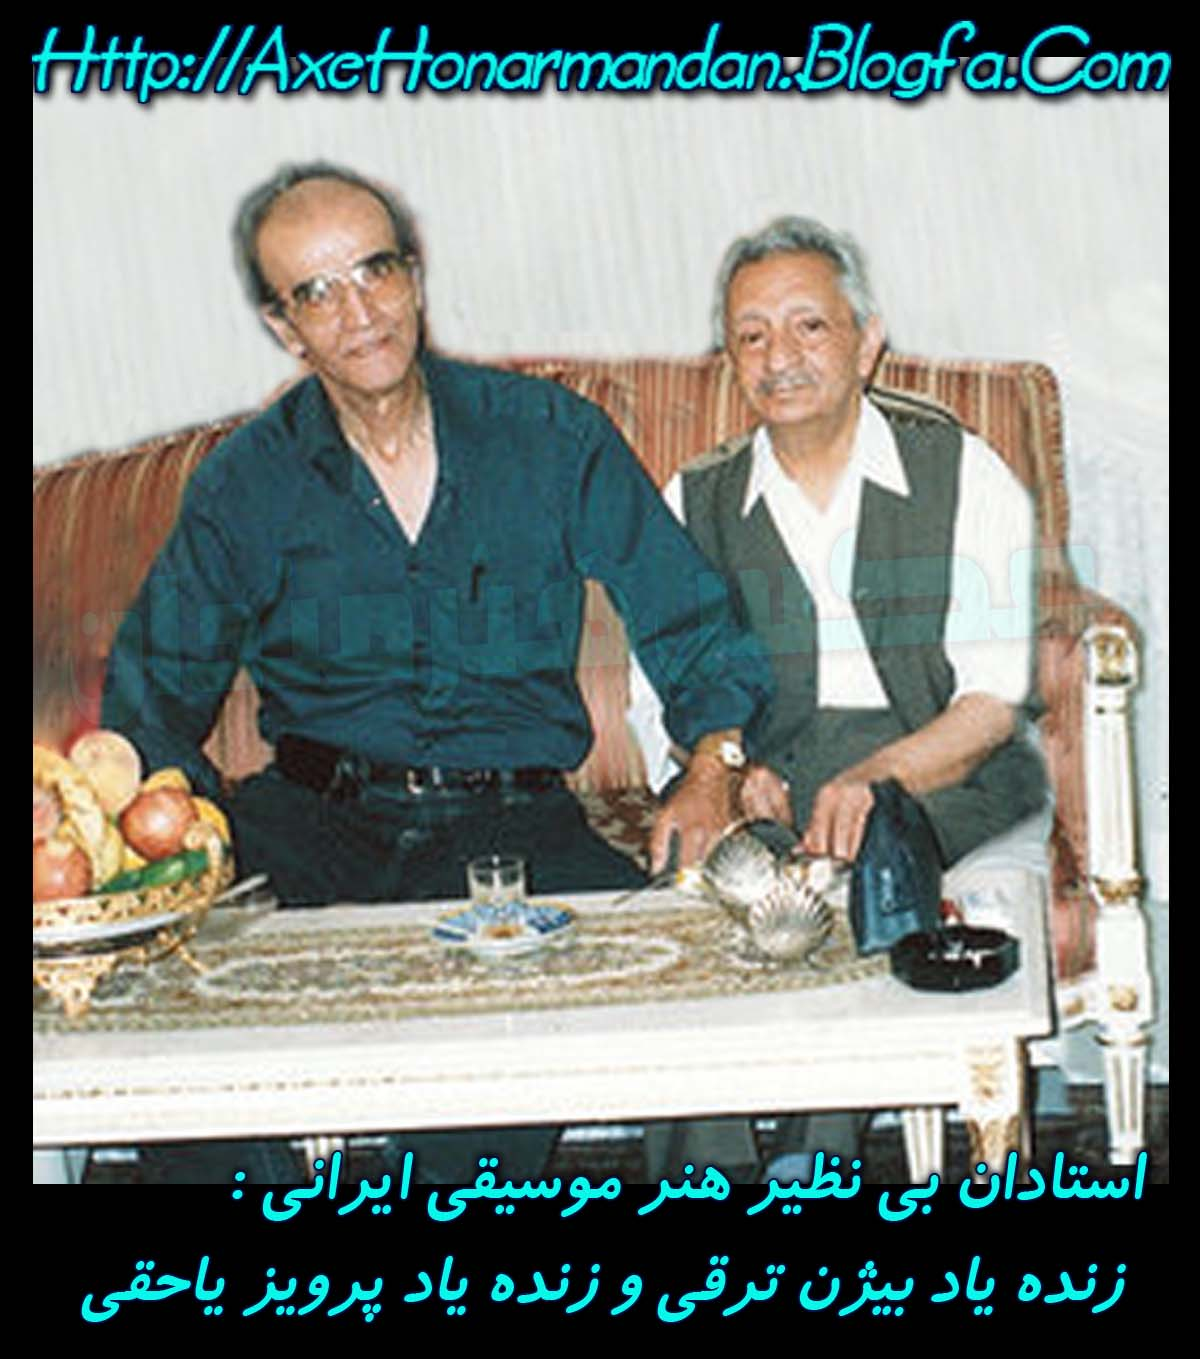 http://mosighi3.persiangig.com/parvizYahaghi_BijanTaraghi/ParvizYahaghi_BijanTaraghi_ShamimRasekhianARCHIVE209.jpg